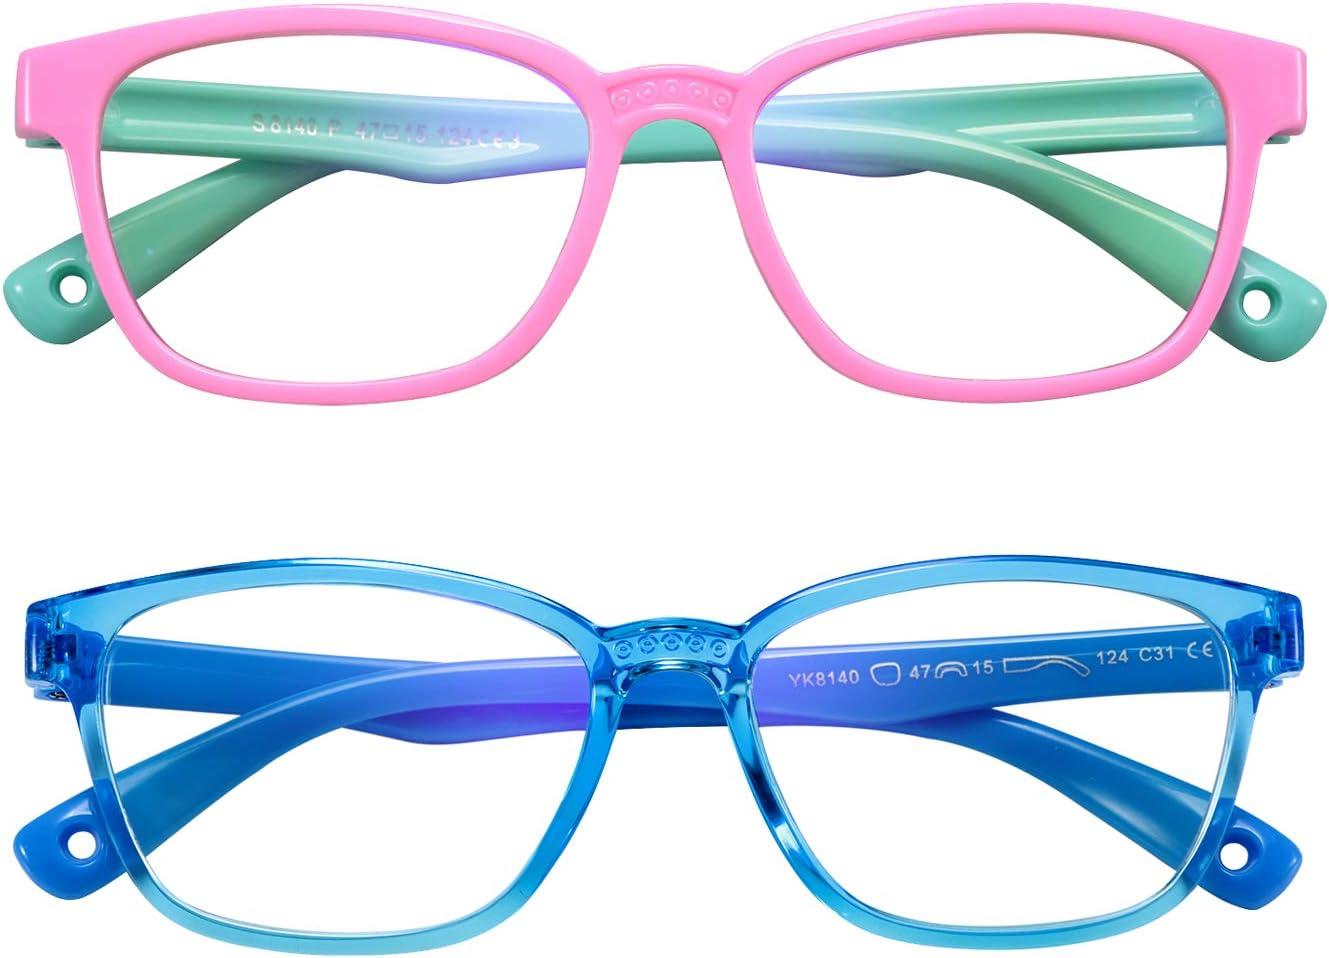 Kids Blue Light Blocking Glasses 2 Pack UV Protection Computer Gaming TV Phone Eyeglasses for Boys Girls Age 3-12